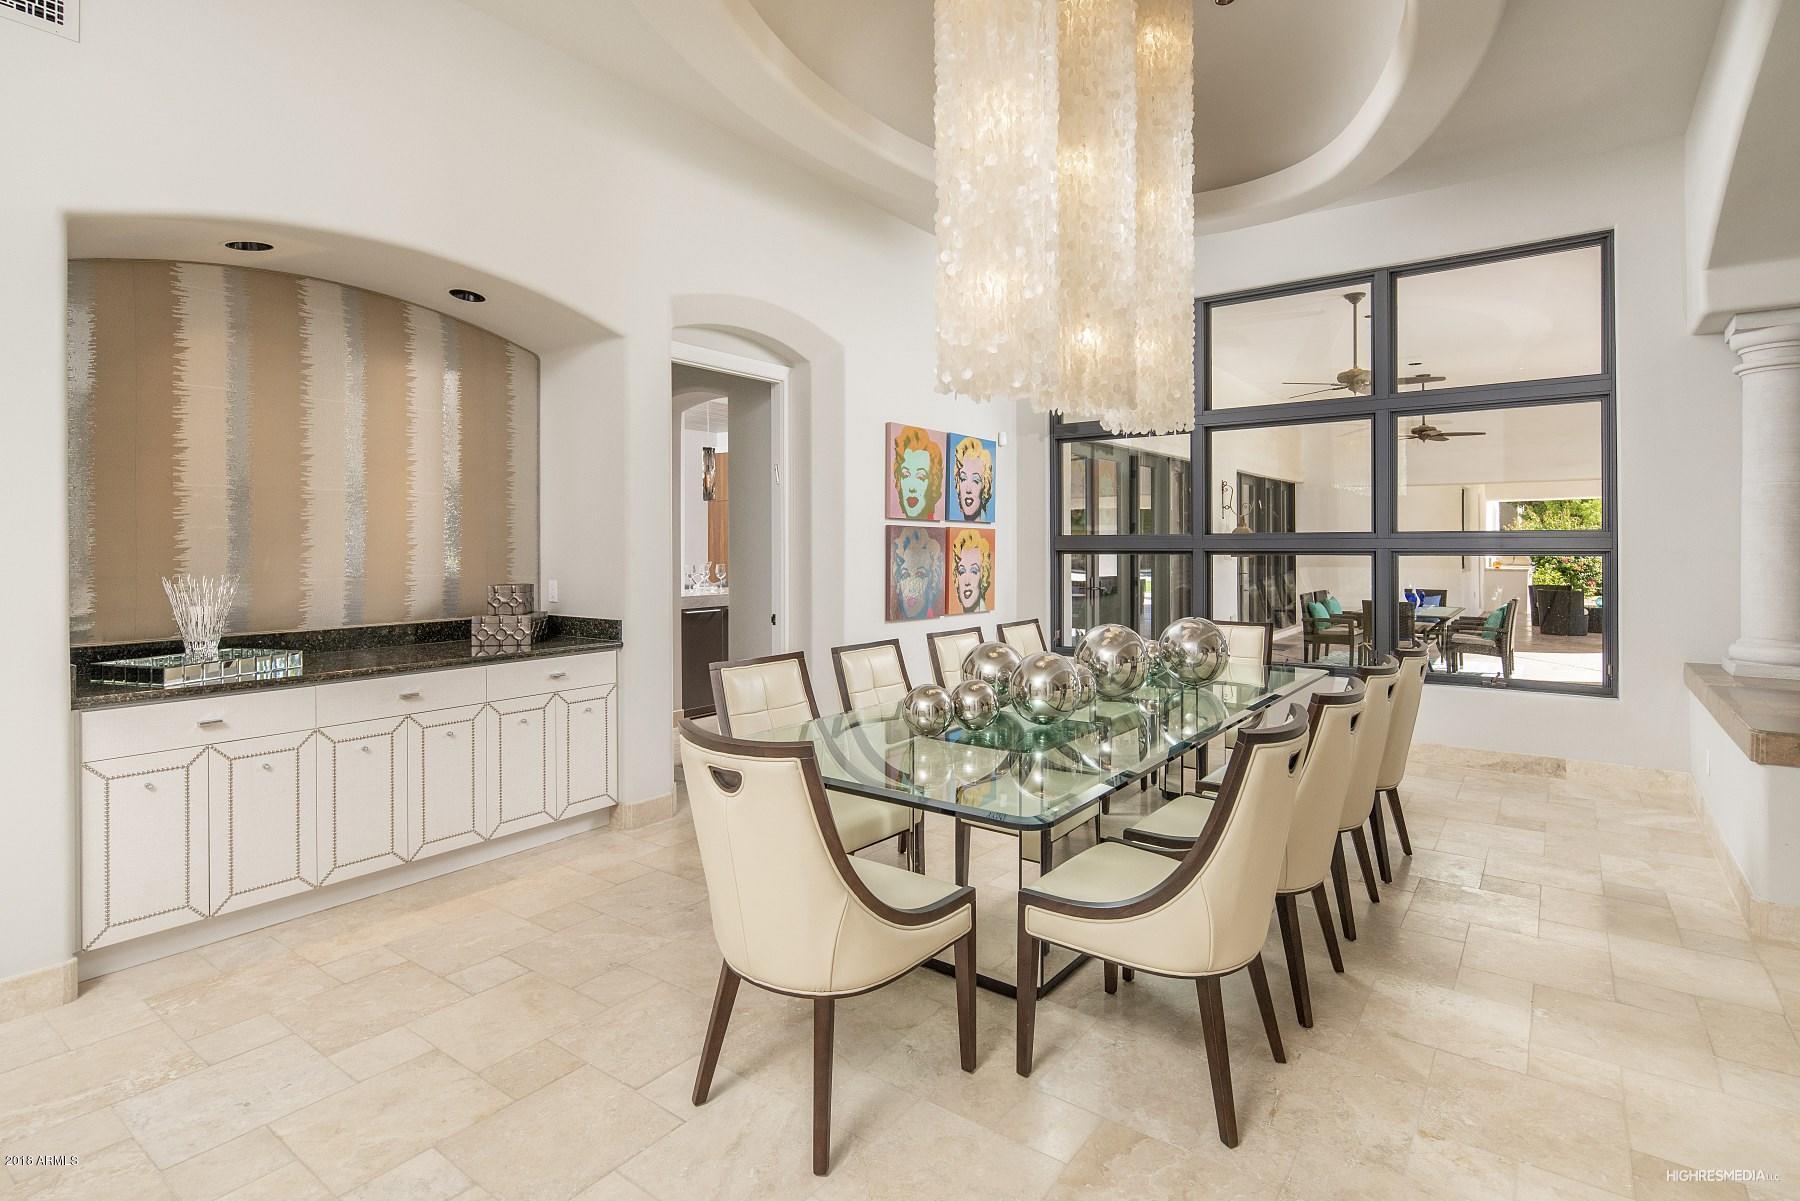 MLS 5837780 5627 N CASA BLANCA Drive, Paradise Valley, AZ Paradise Valley Horse Property for Sale